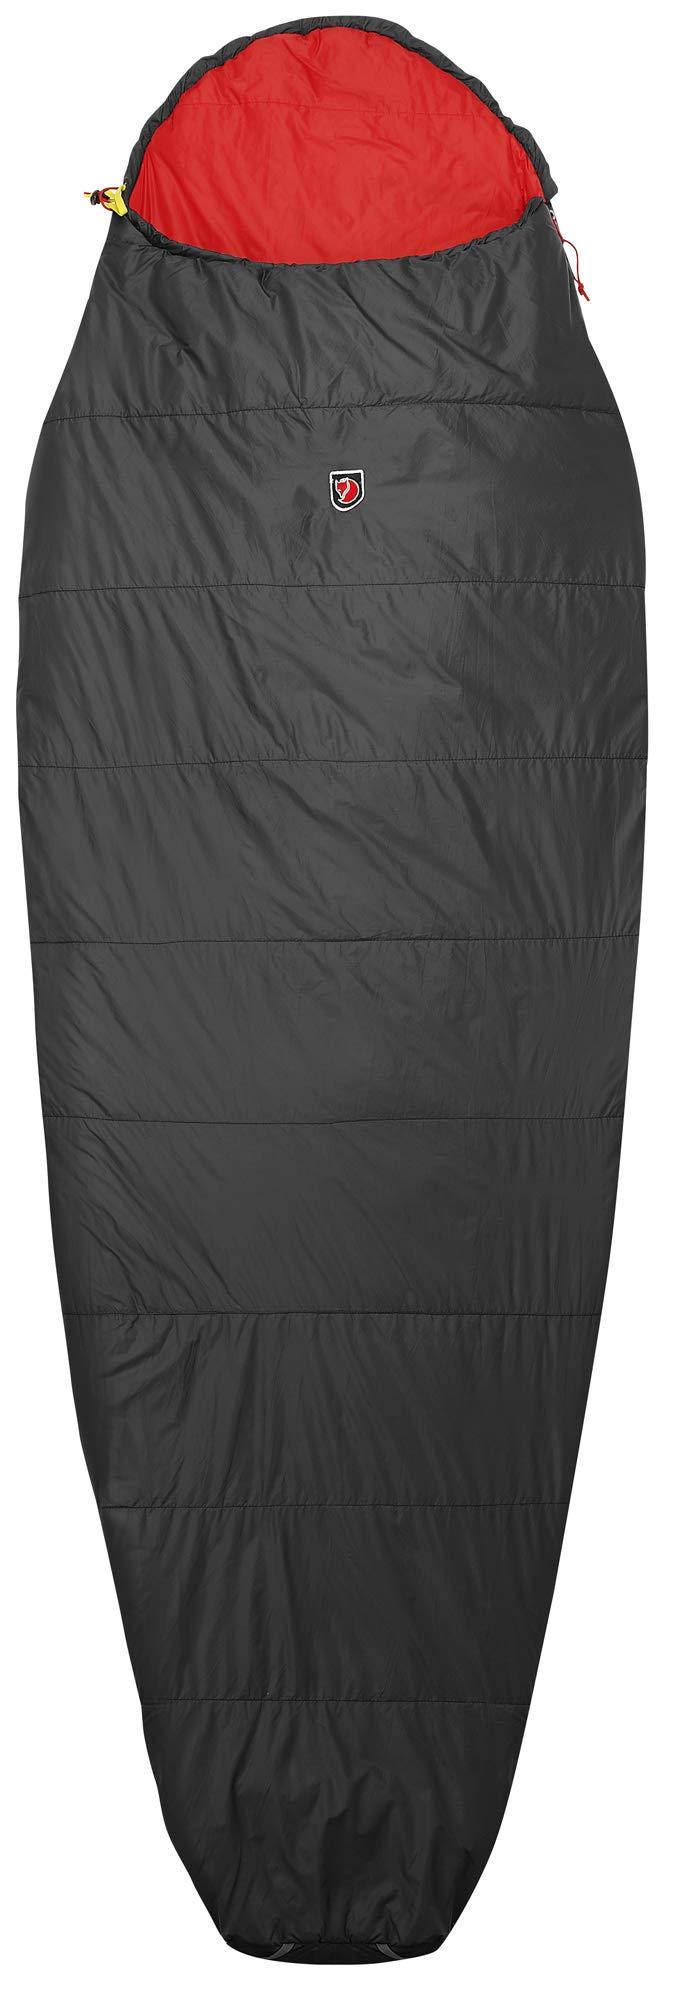 Fjällräven Unisex-Adult Funäs Lite Long Sleeping Bag, Dark Grey, OneSize